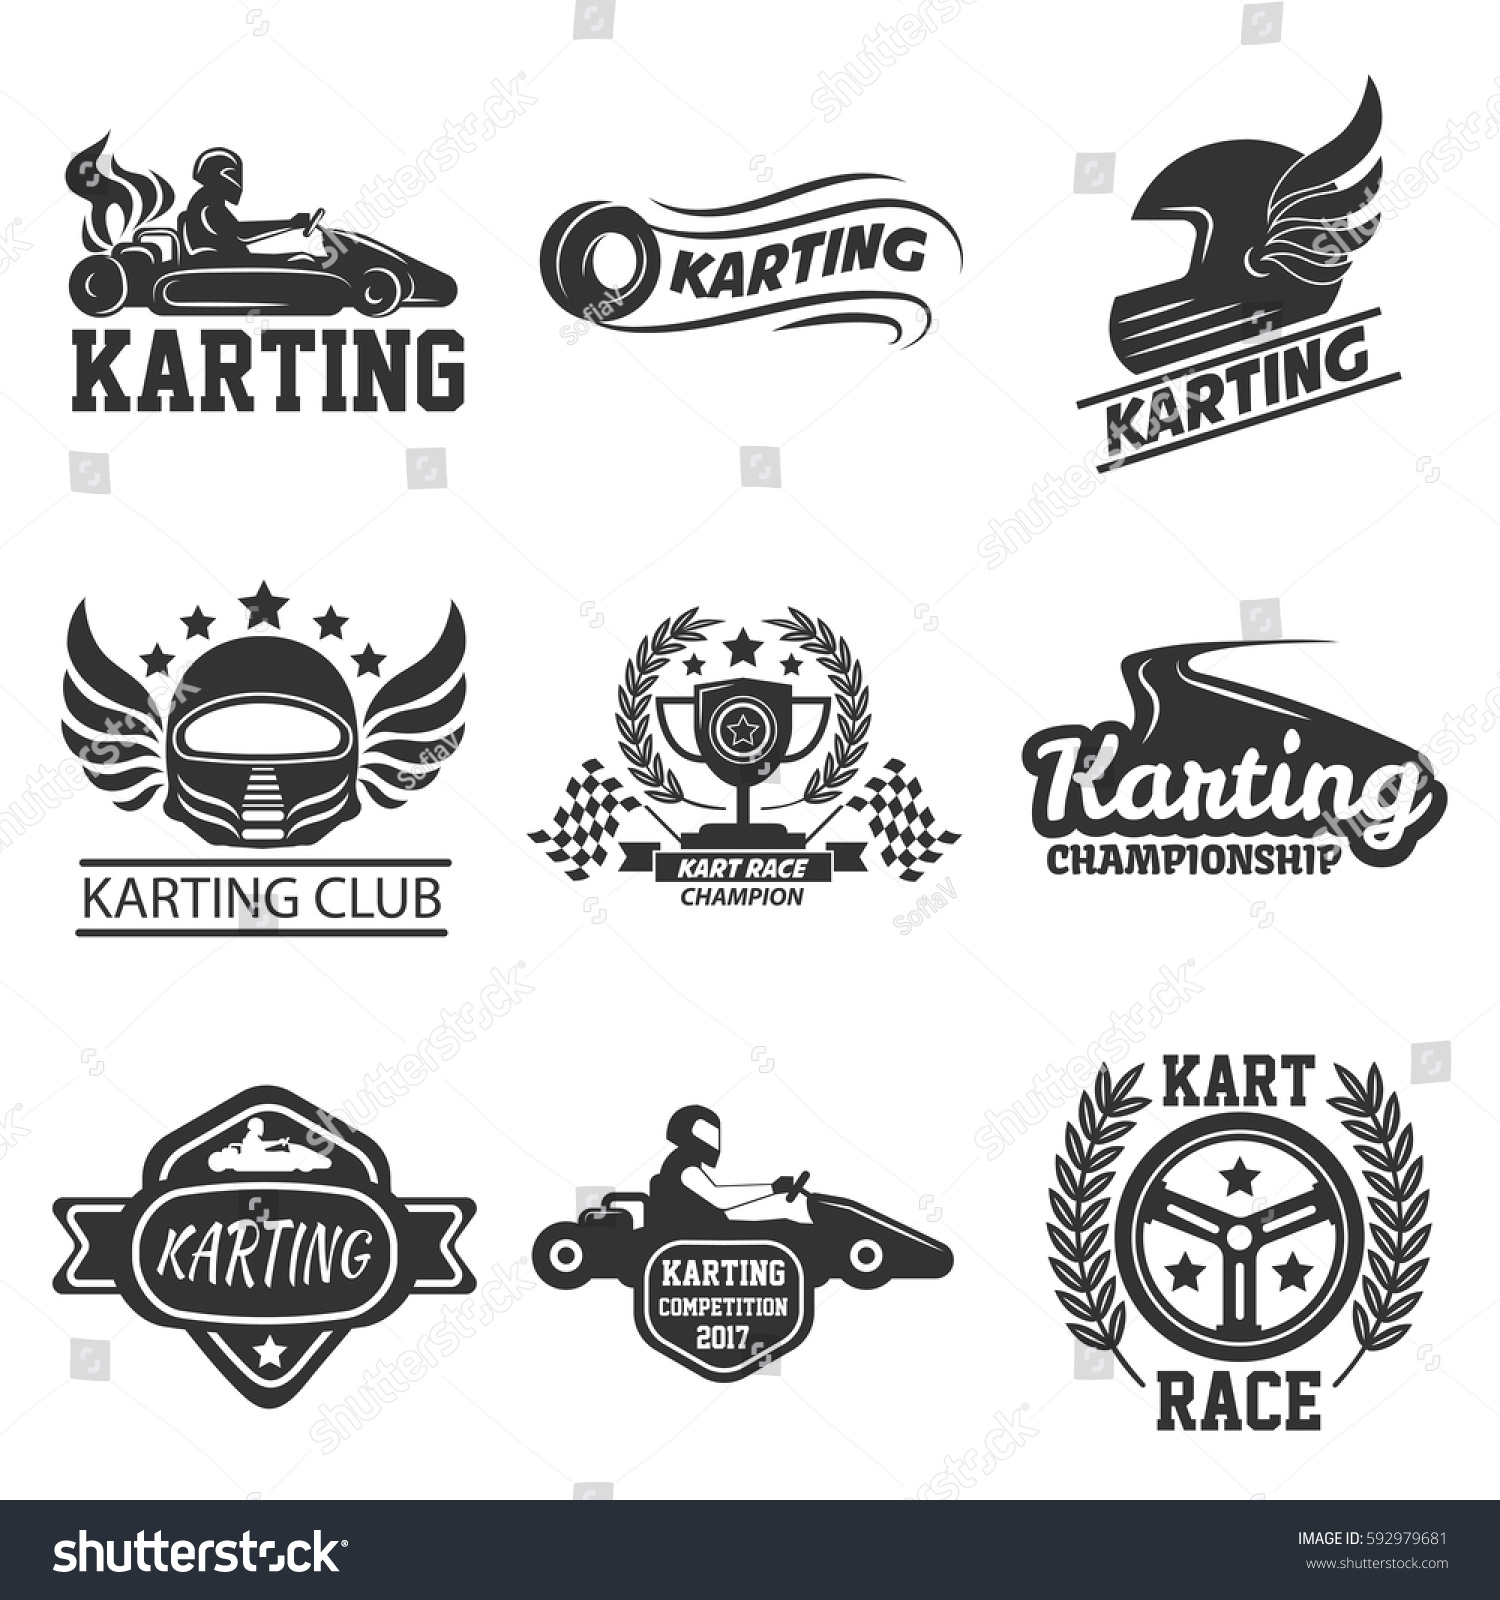 Karting Kart Races Club Tournament Logo Vector de stock592979681 ...